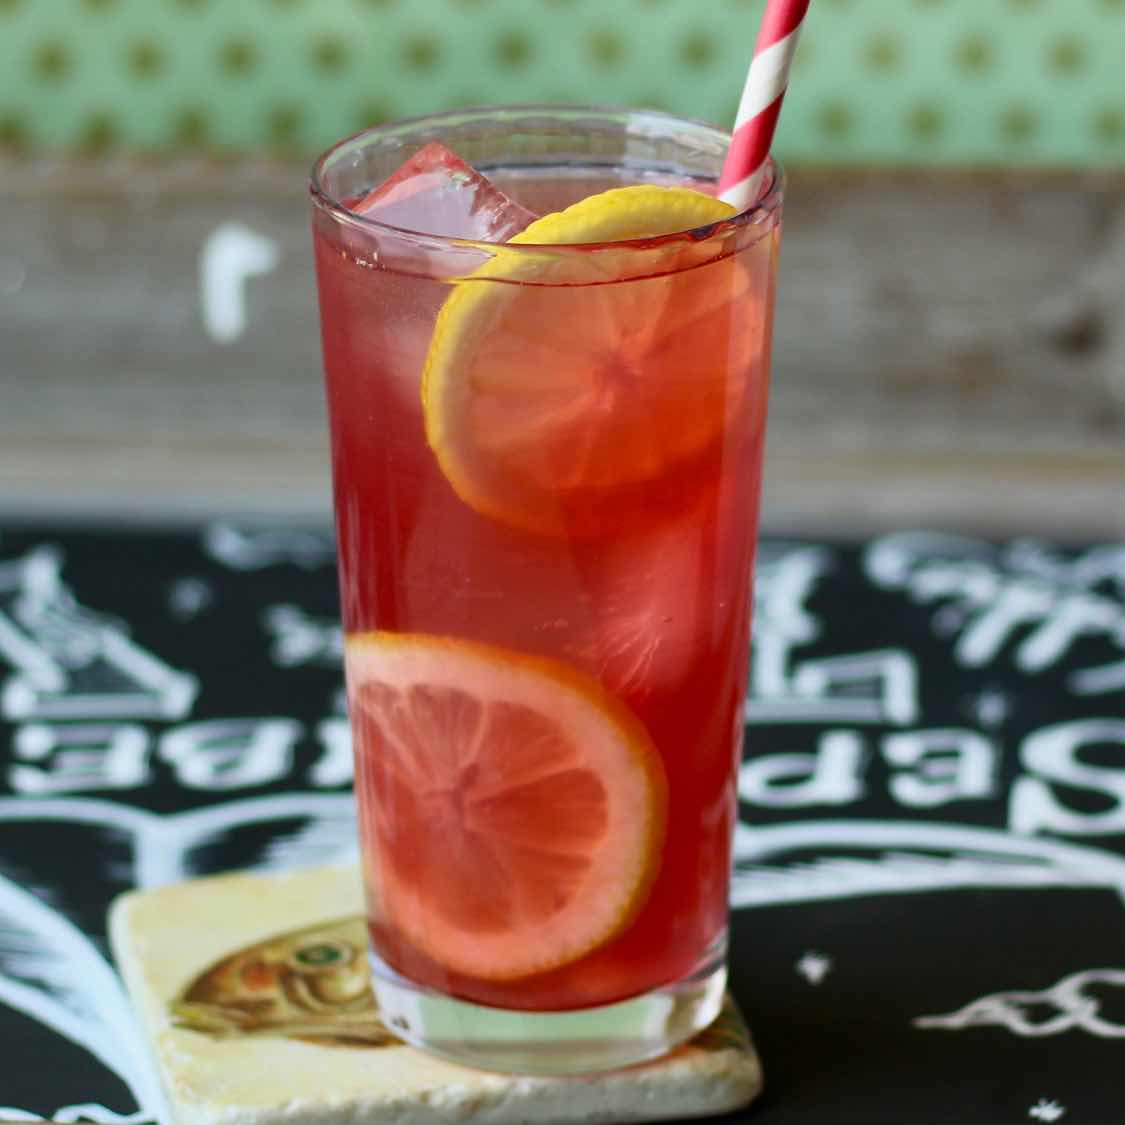 Long Beach Ice Tea - A Refreshing Twist on a Long Island Ice Tea